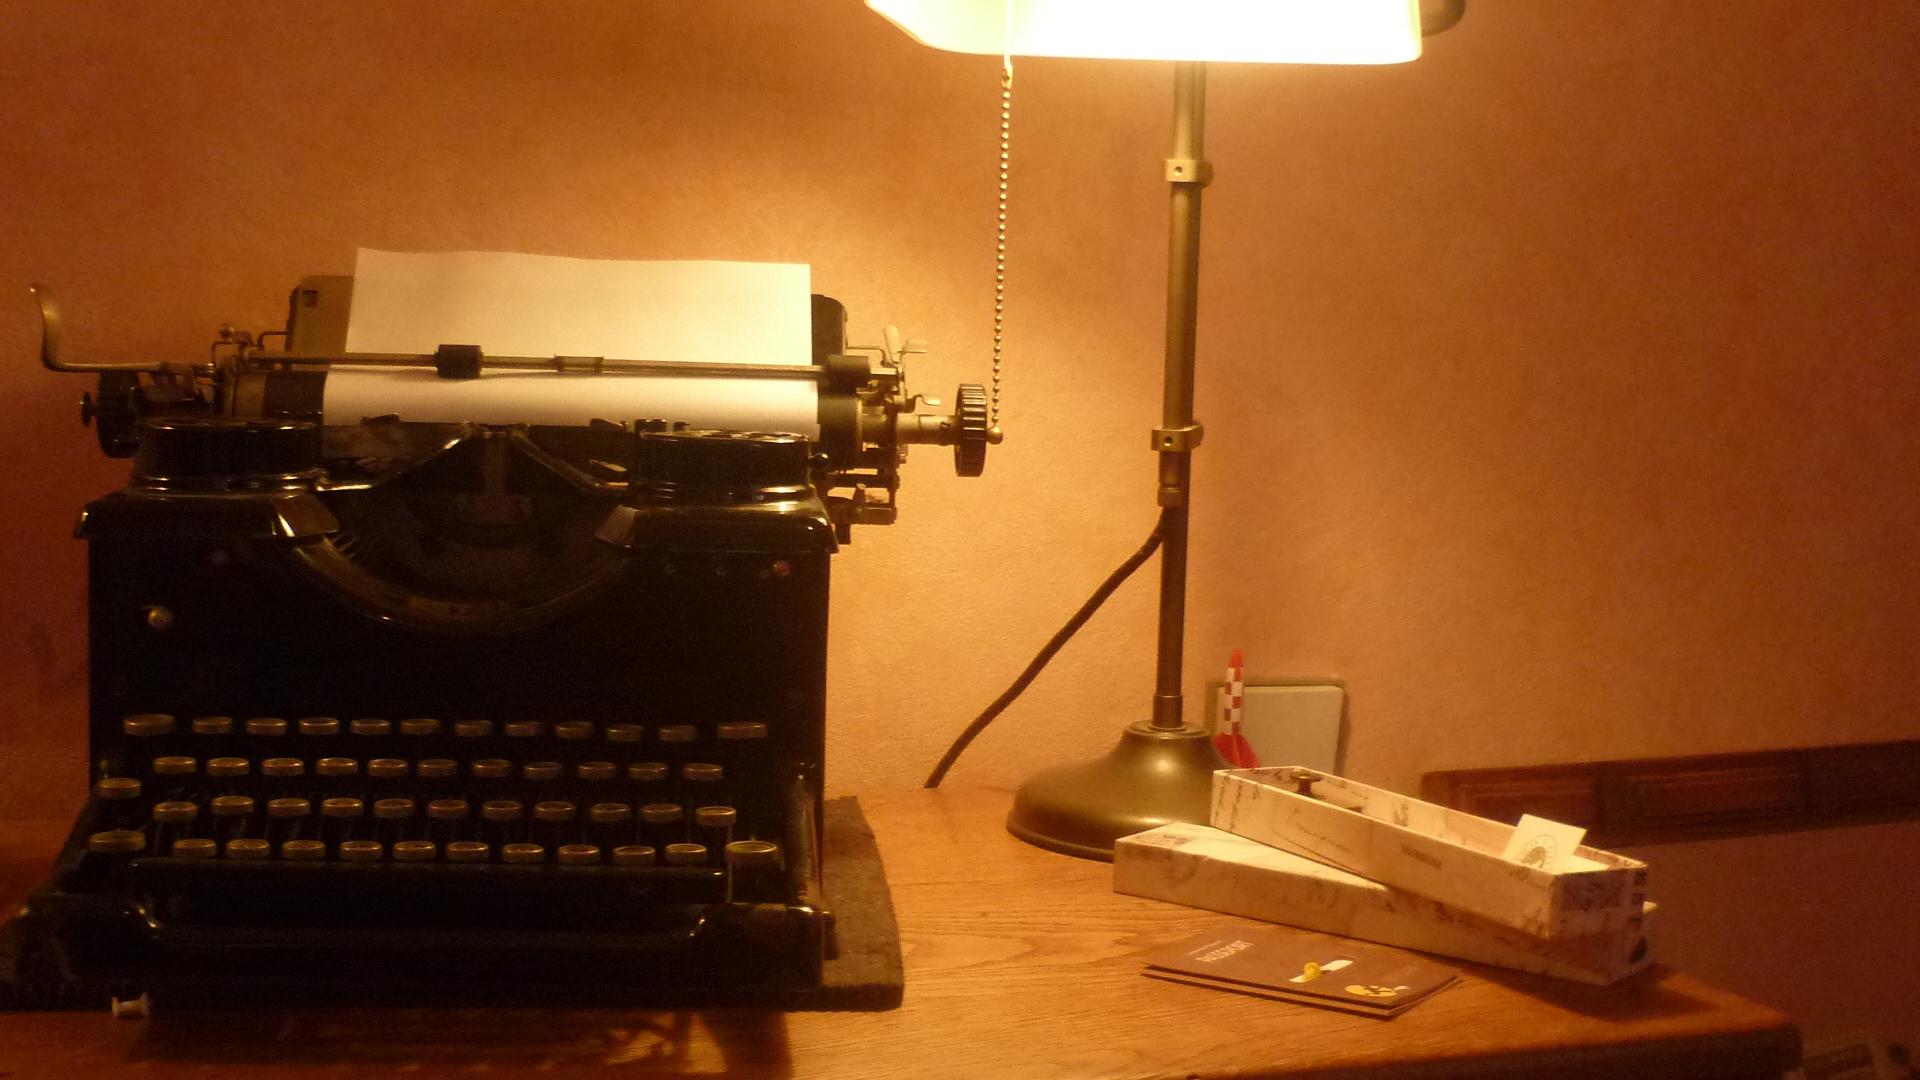 La m quina de escribir - Escritorio para escribir ...